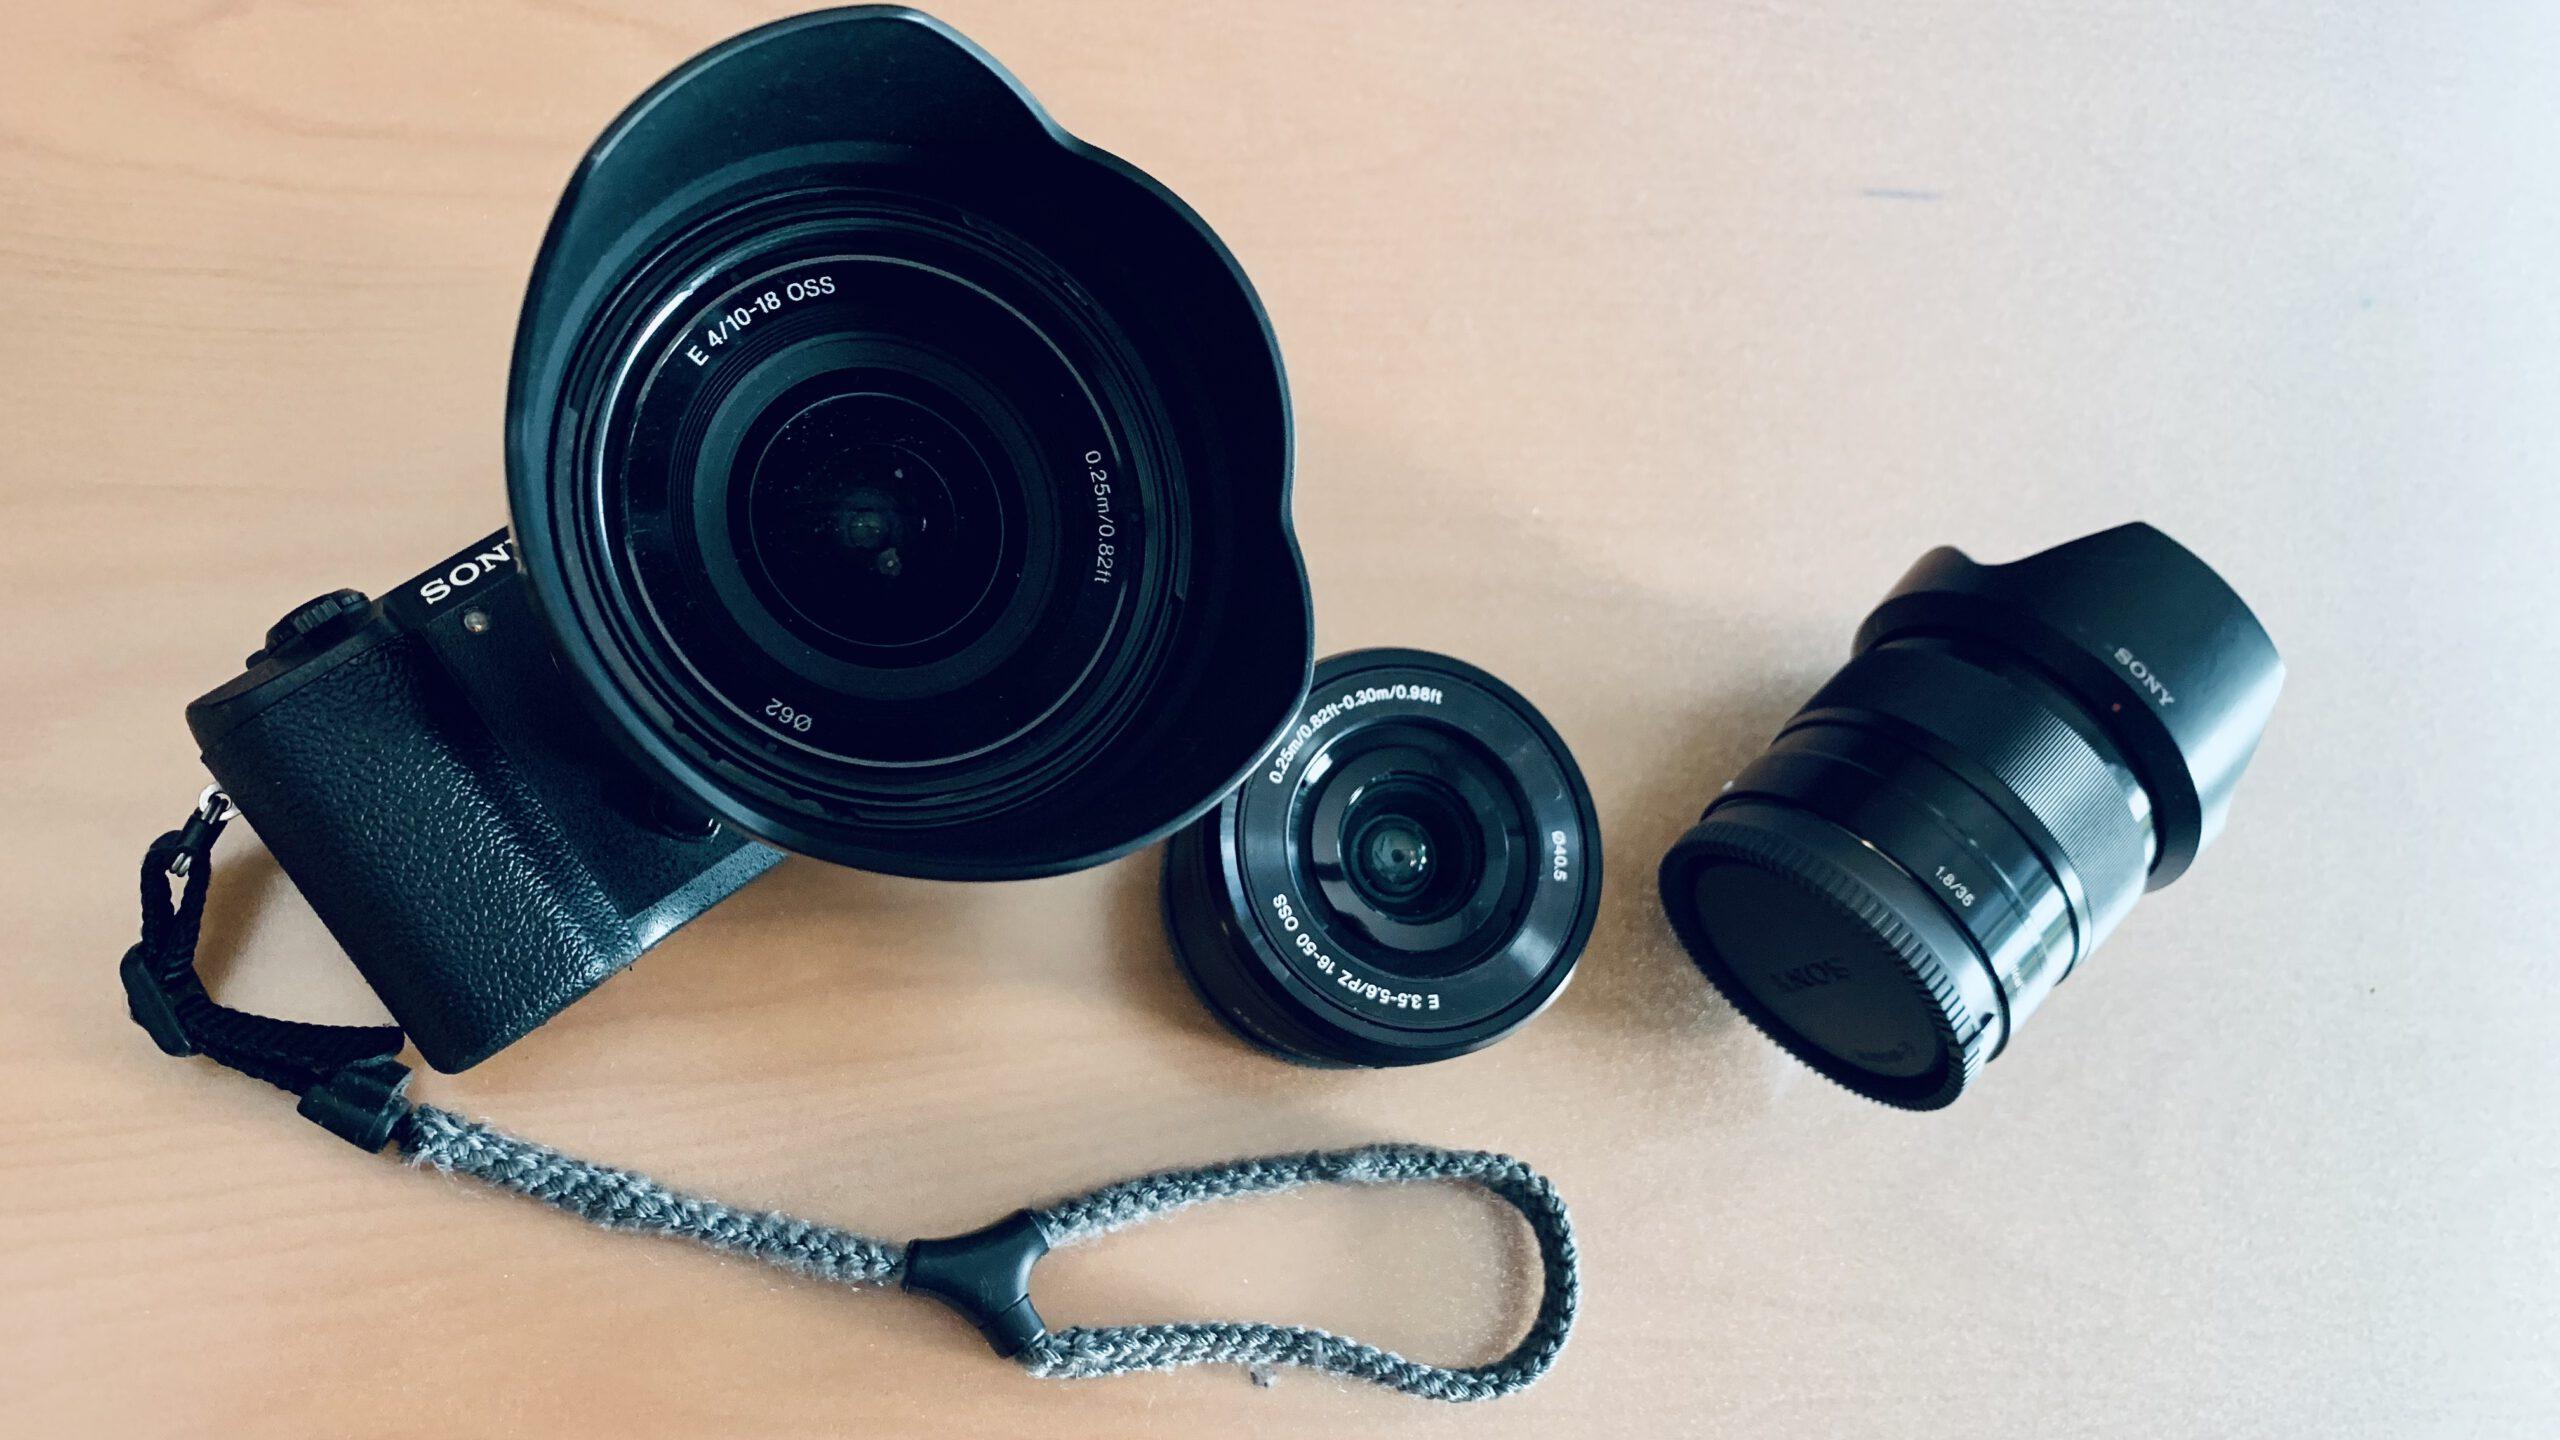 Kamera und Objektive scaled